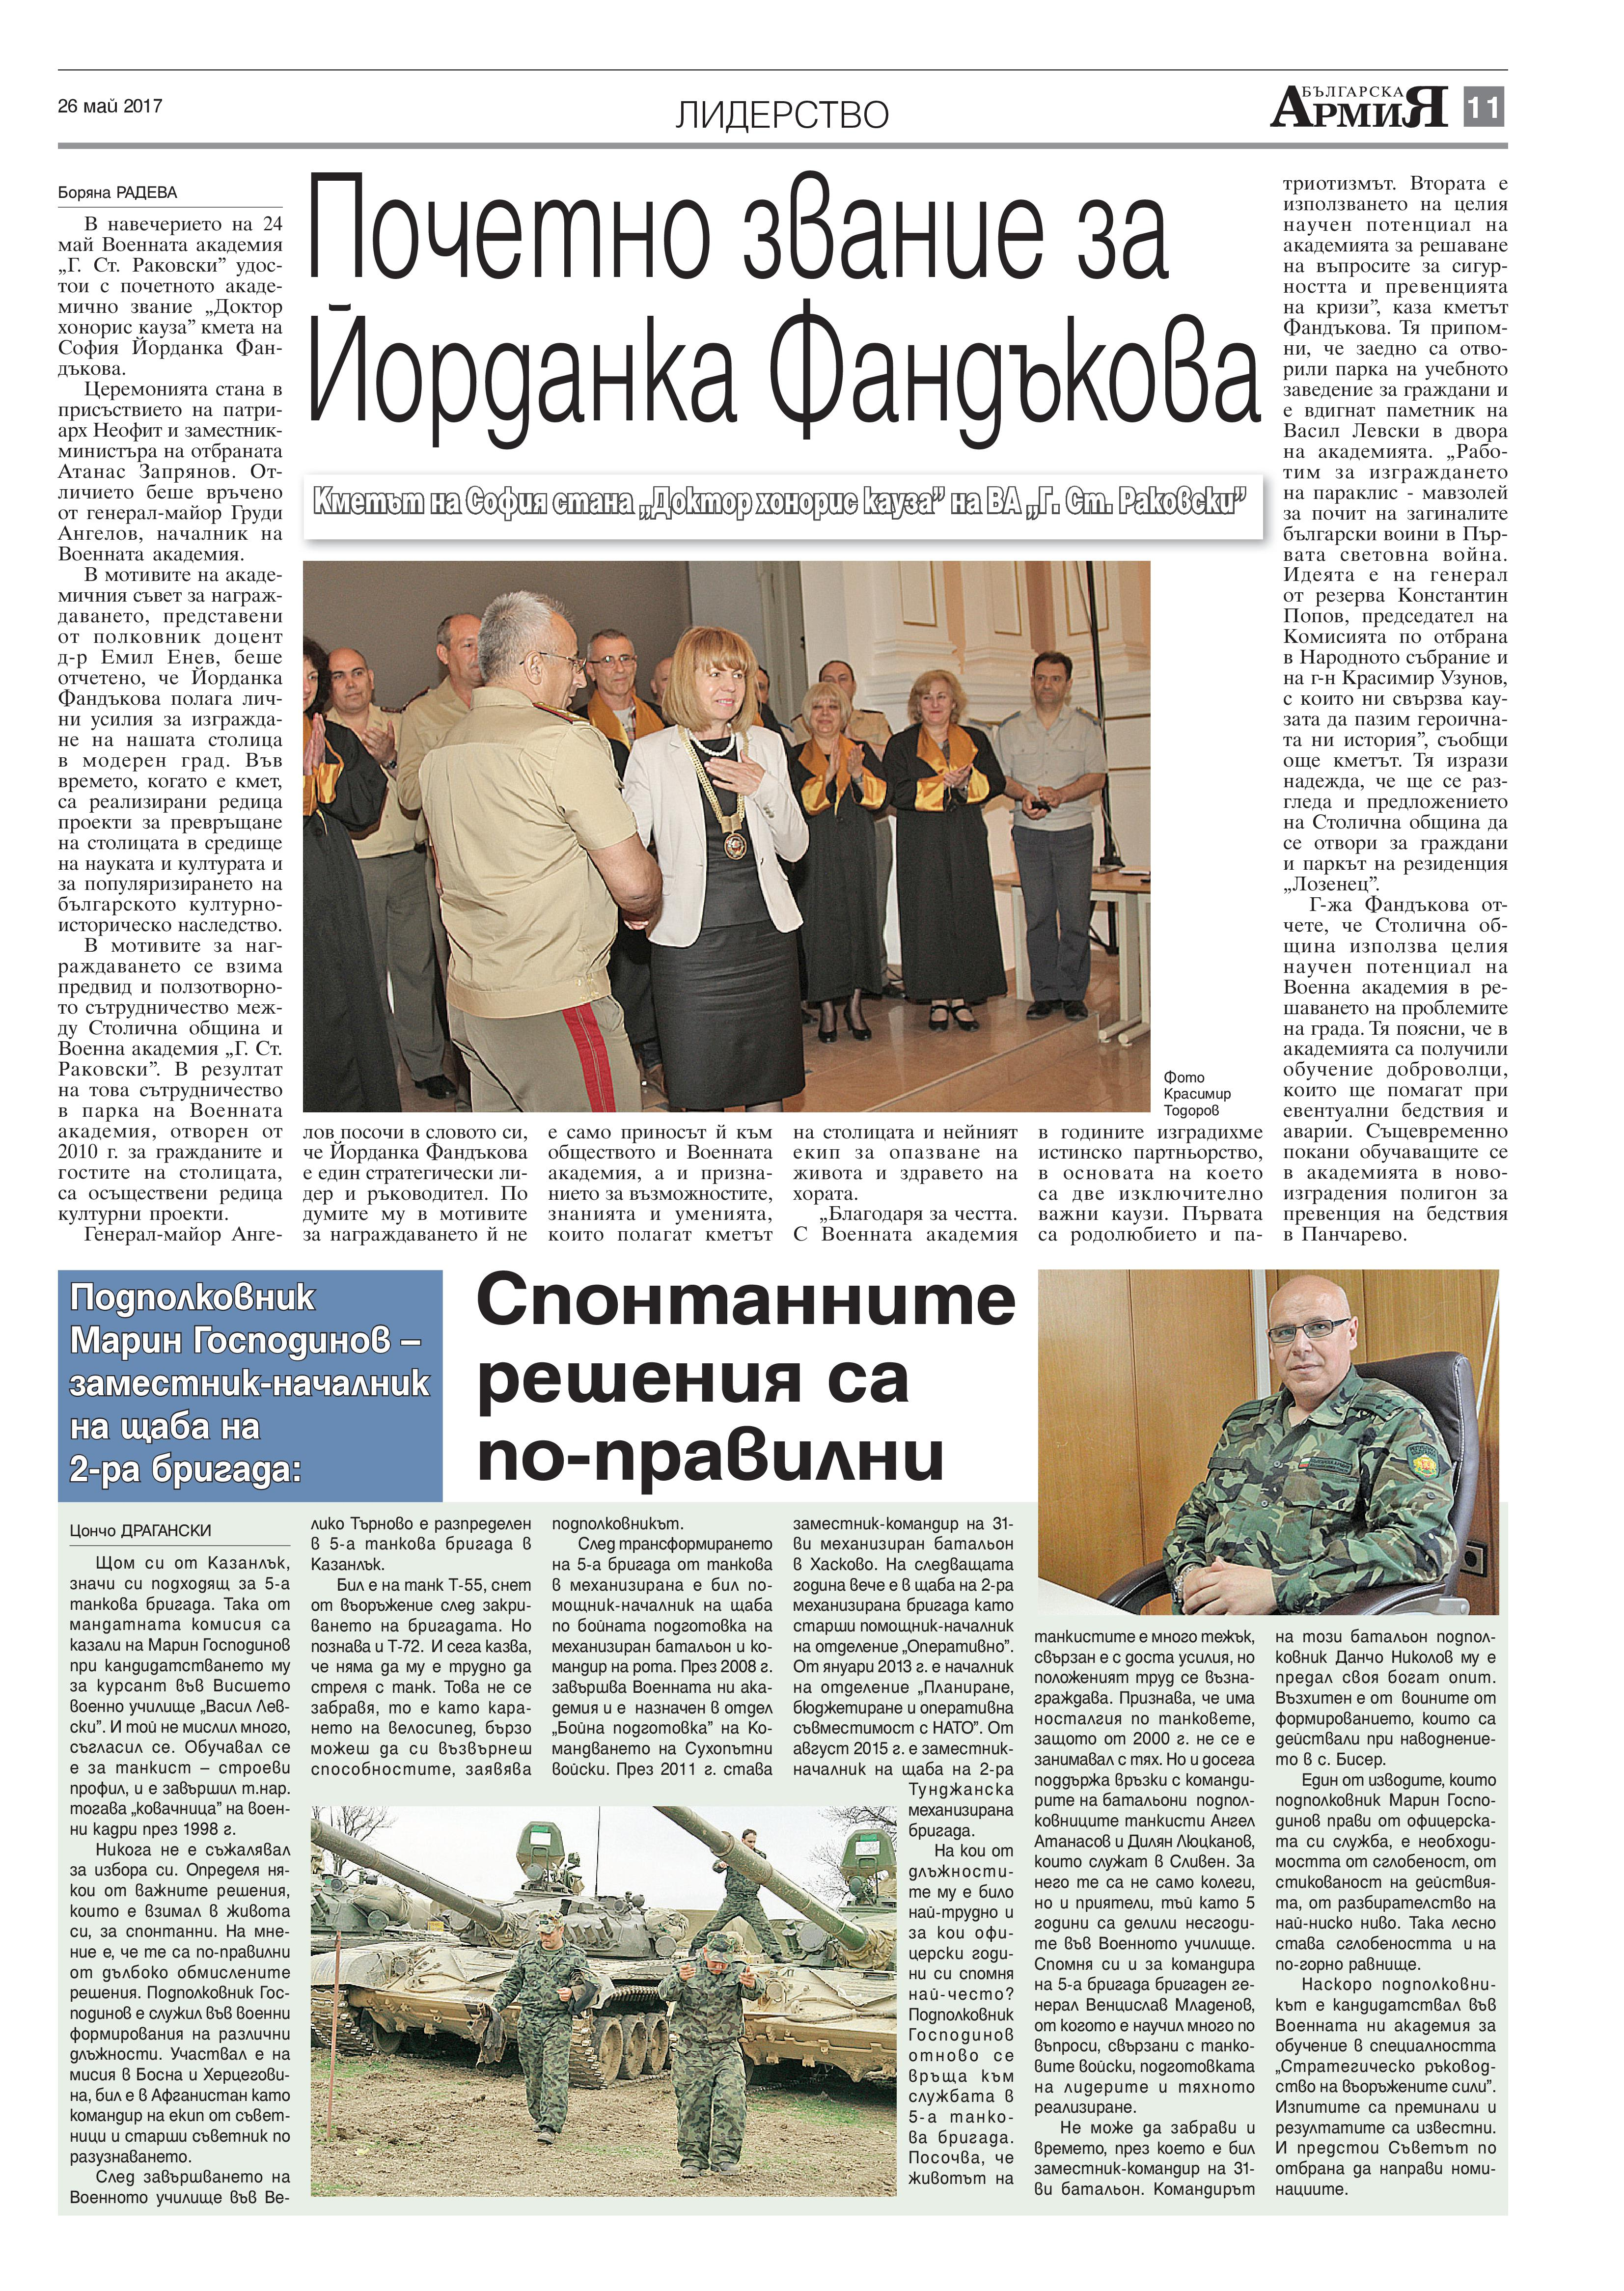 https://www.armymedia.bg/wp-content/uploads/2017/05/11-4.jpg